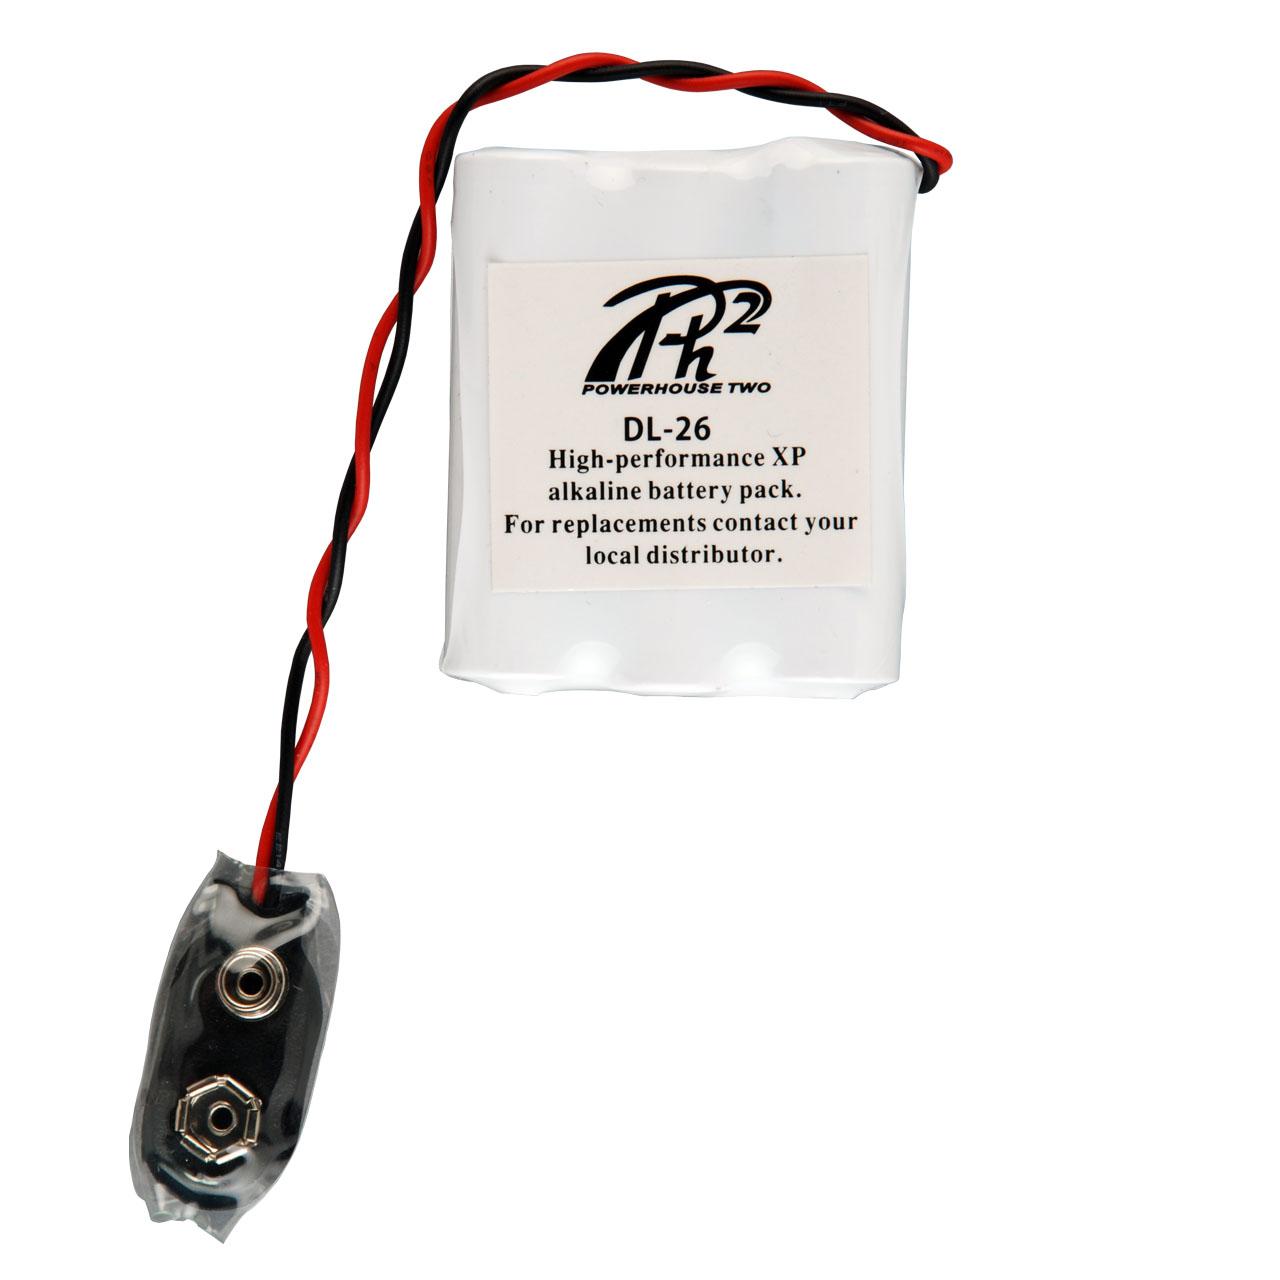 DL-26 Hospitality Battery Pack